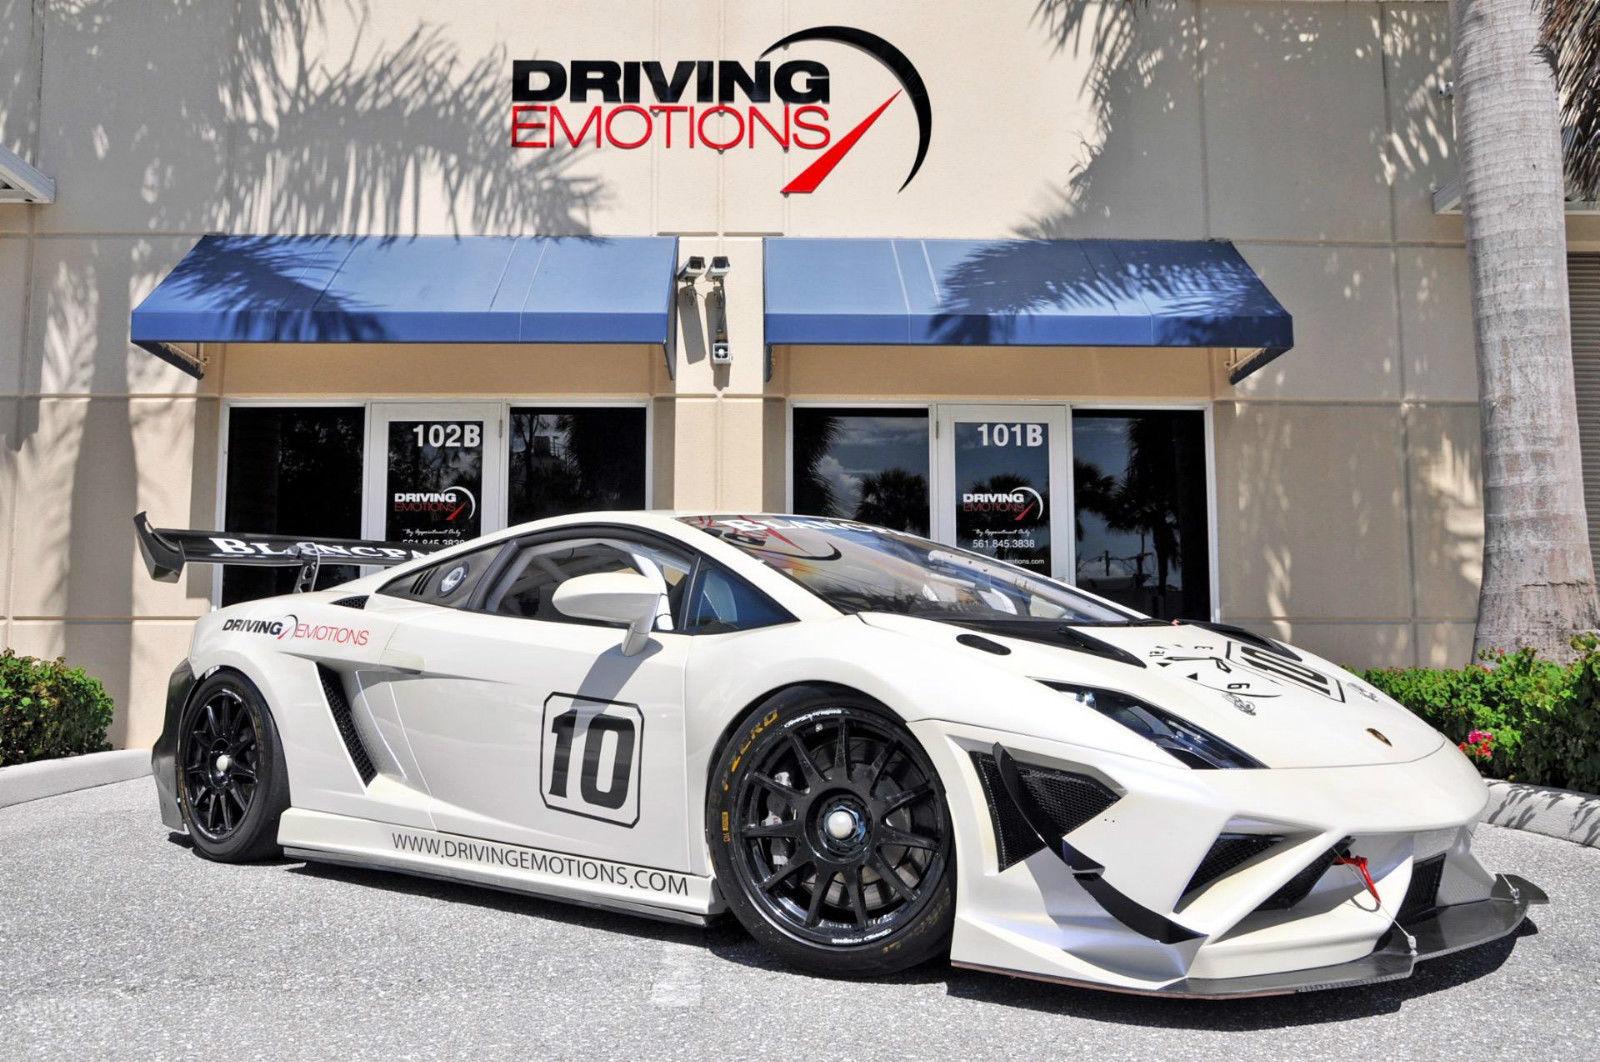 Amazing 2013 Lamborghini Gallardo Lp570 Super Trofeo Race